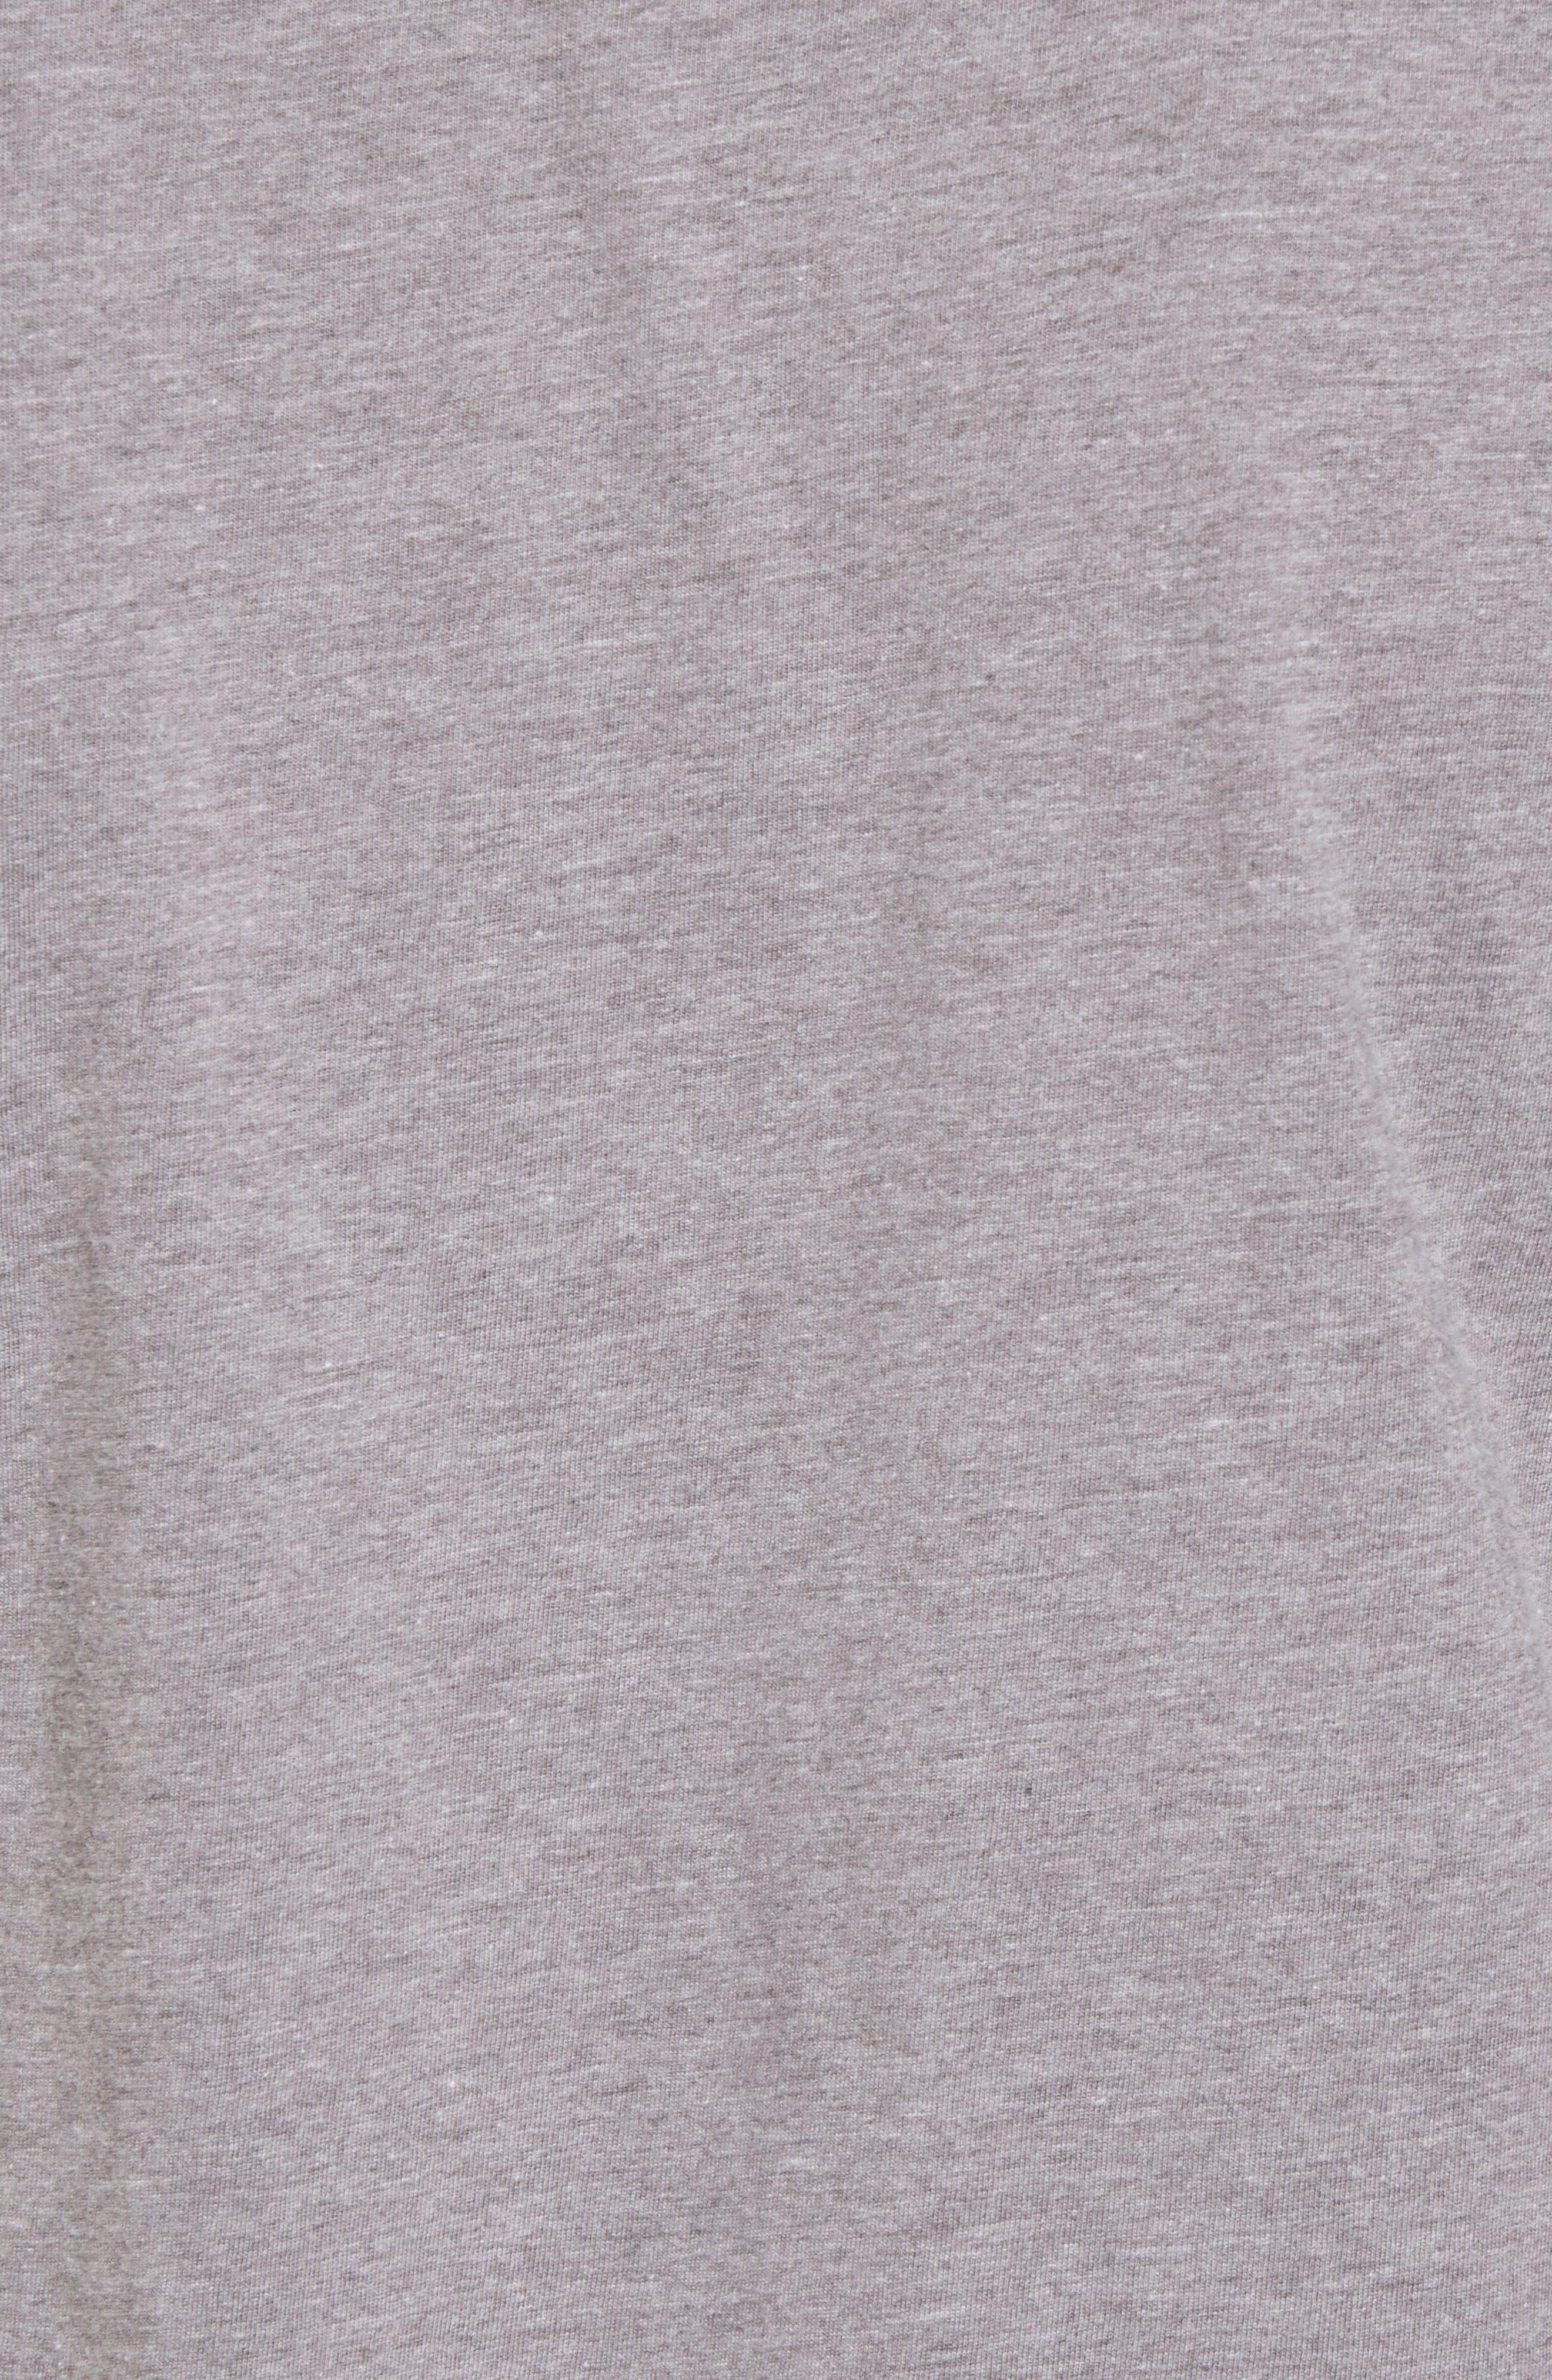 Crosby Boston Bruins T-Shirt,                             Alternate thumbnail 5, color,                             Heather Grey